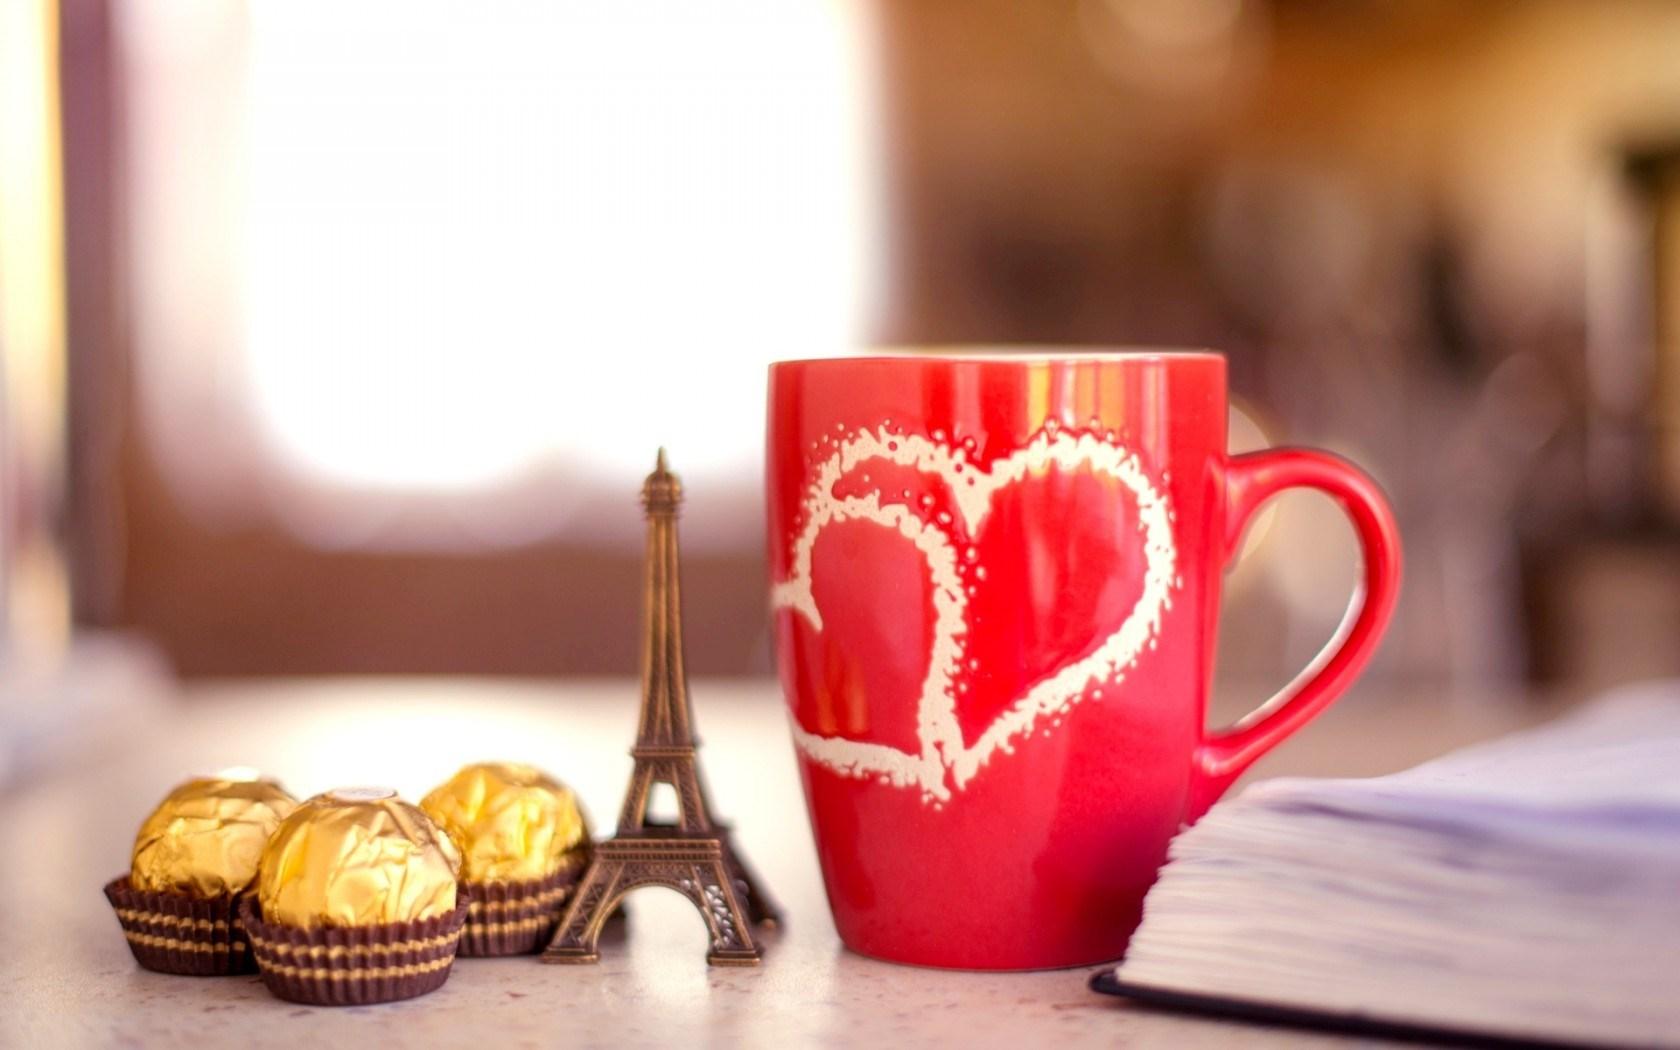 Mood Mug Red Hearts Chocolate Candy Notebook Eiffel Tower Love